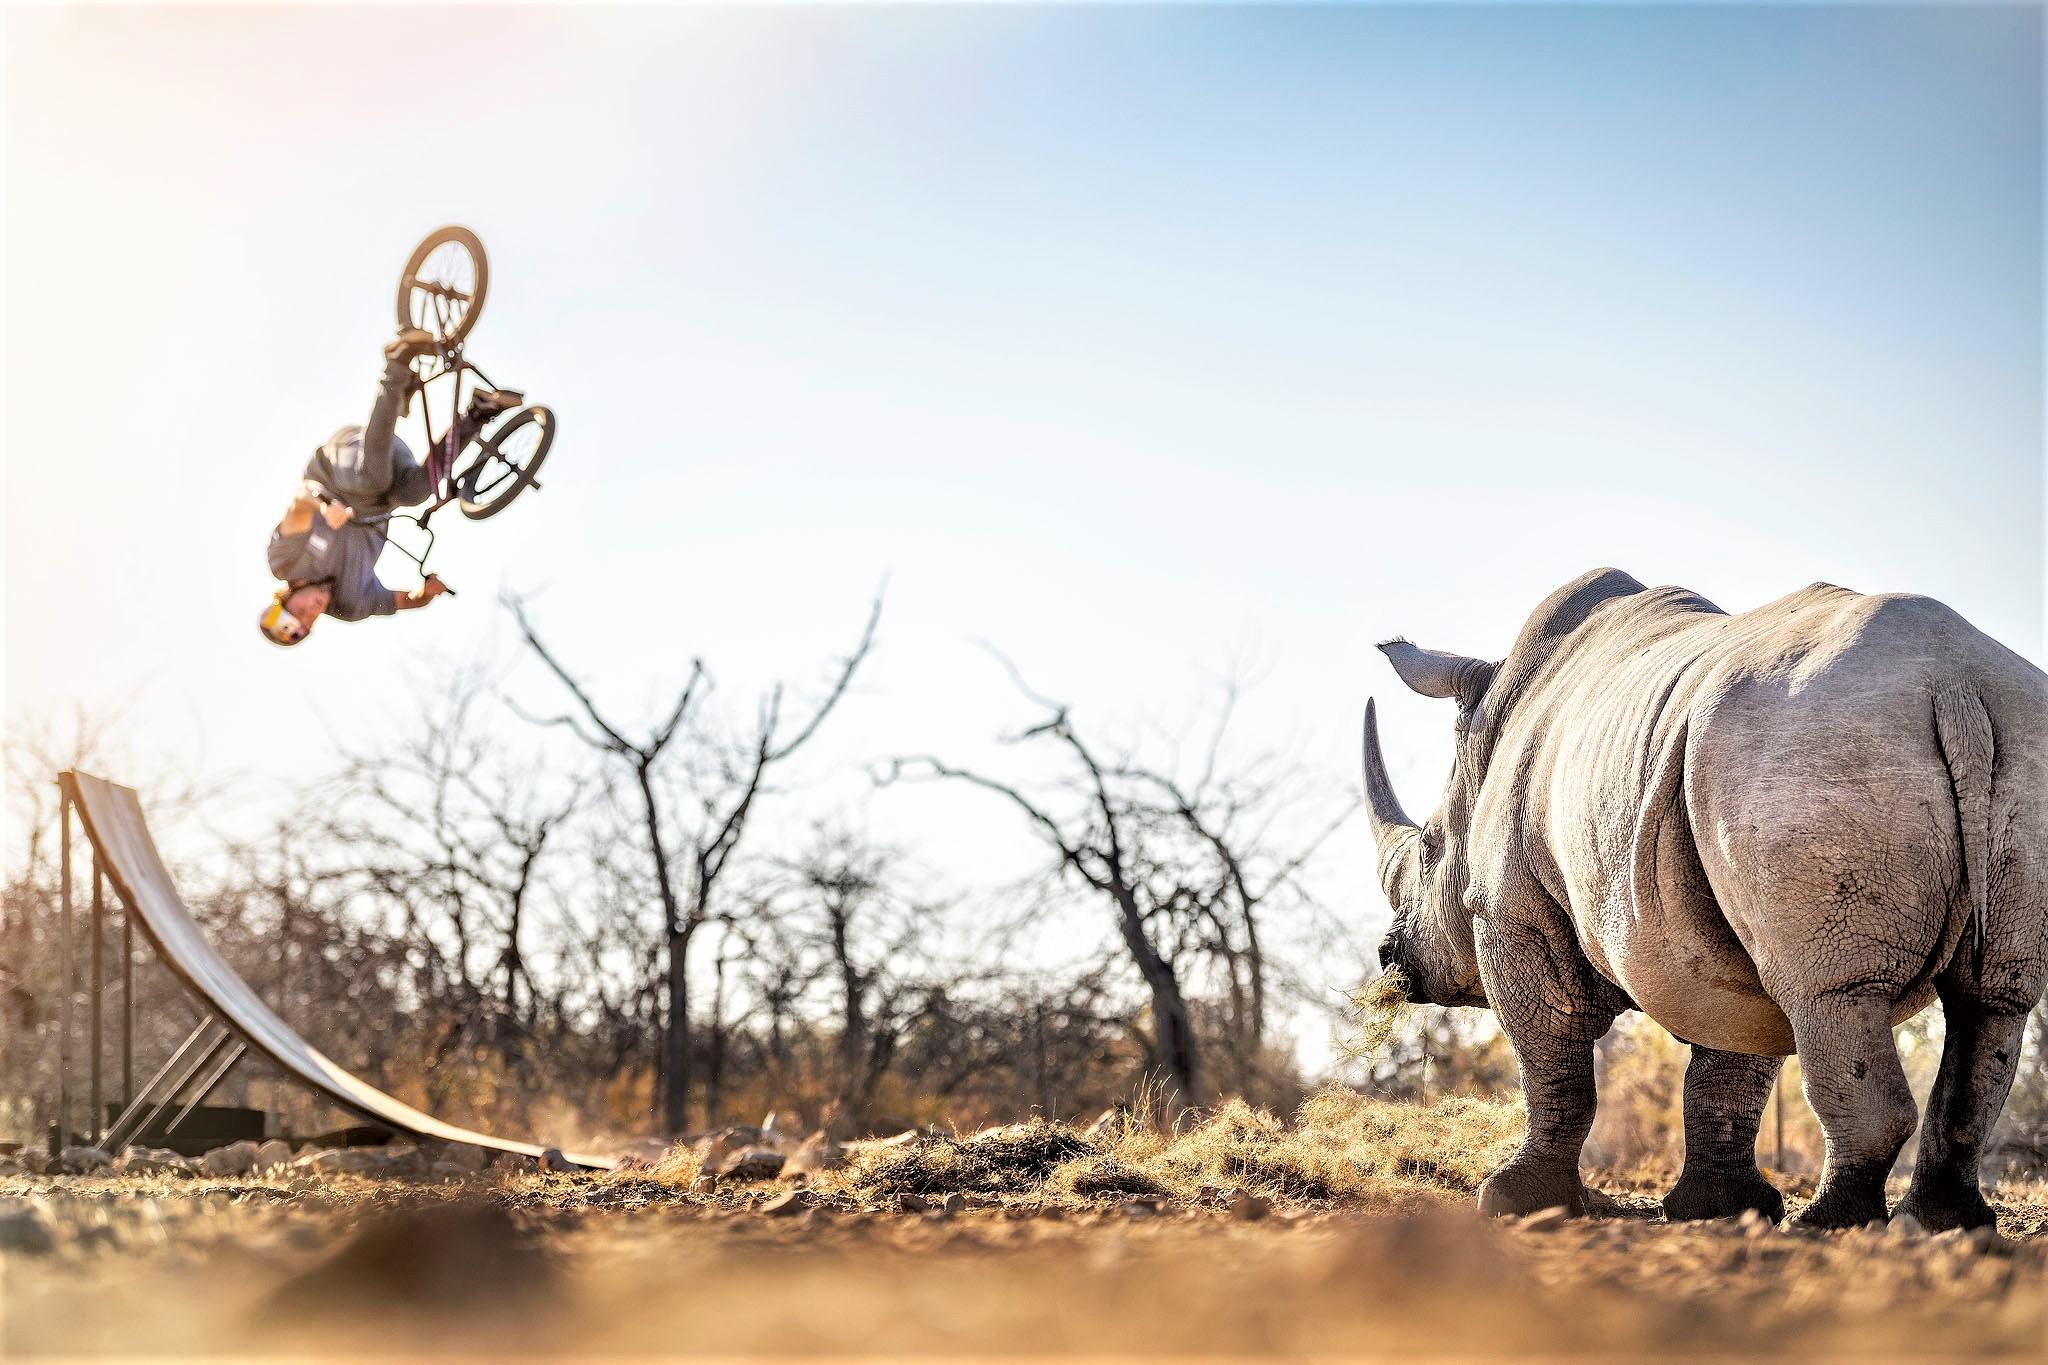 Flair for Rhinos!